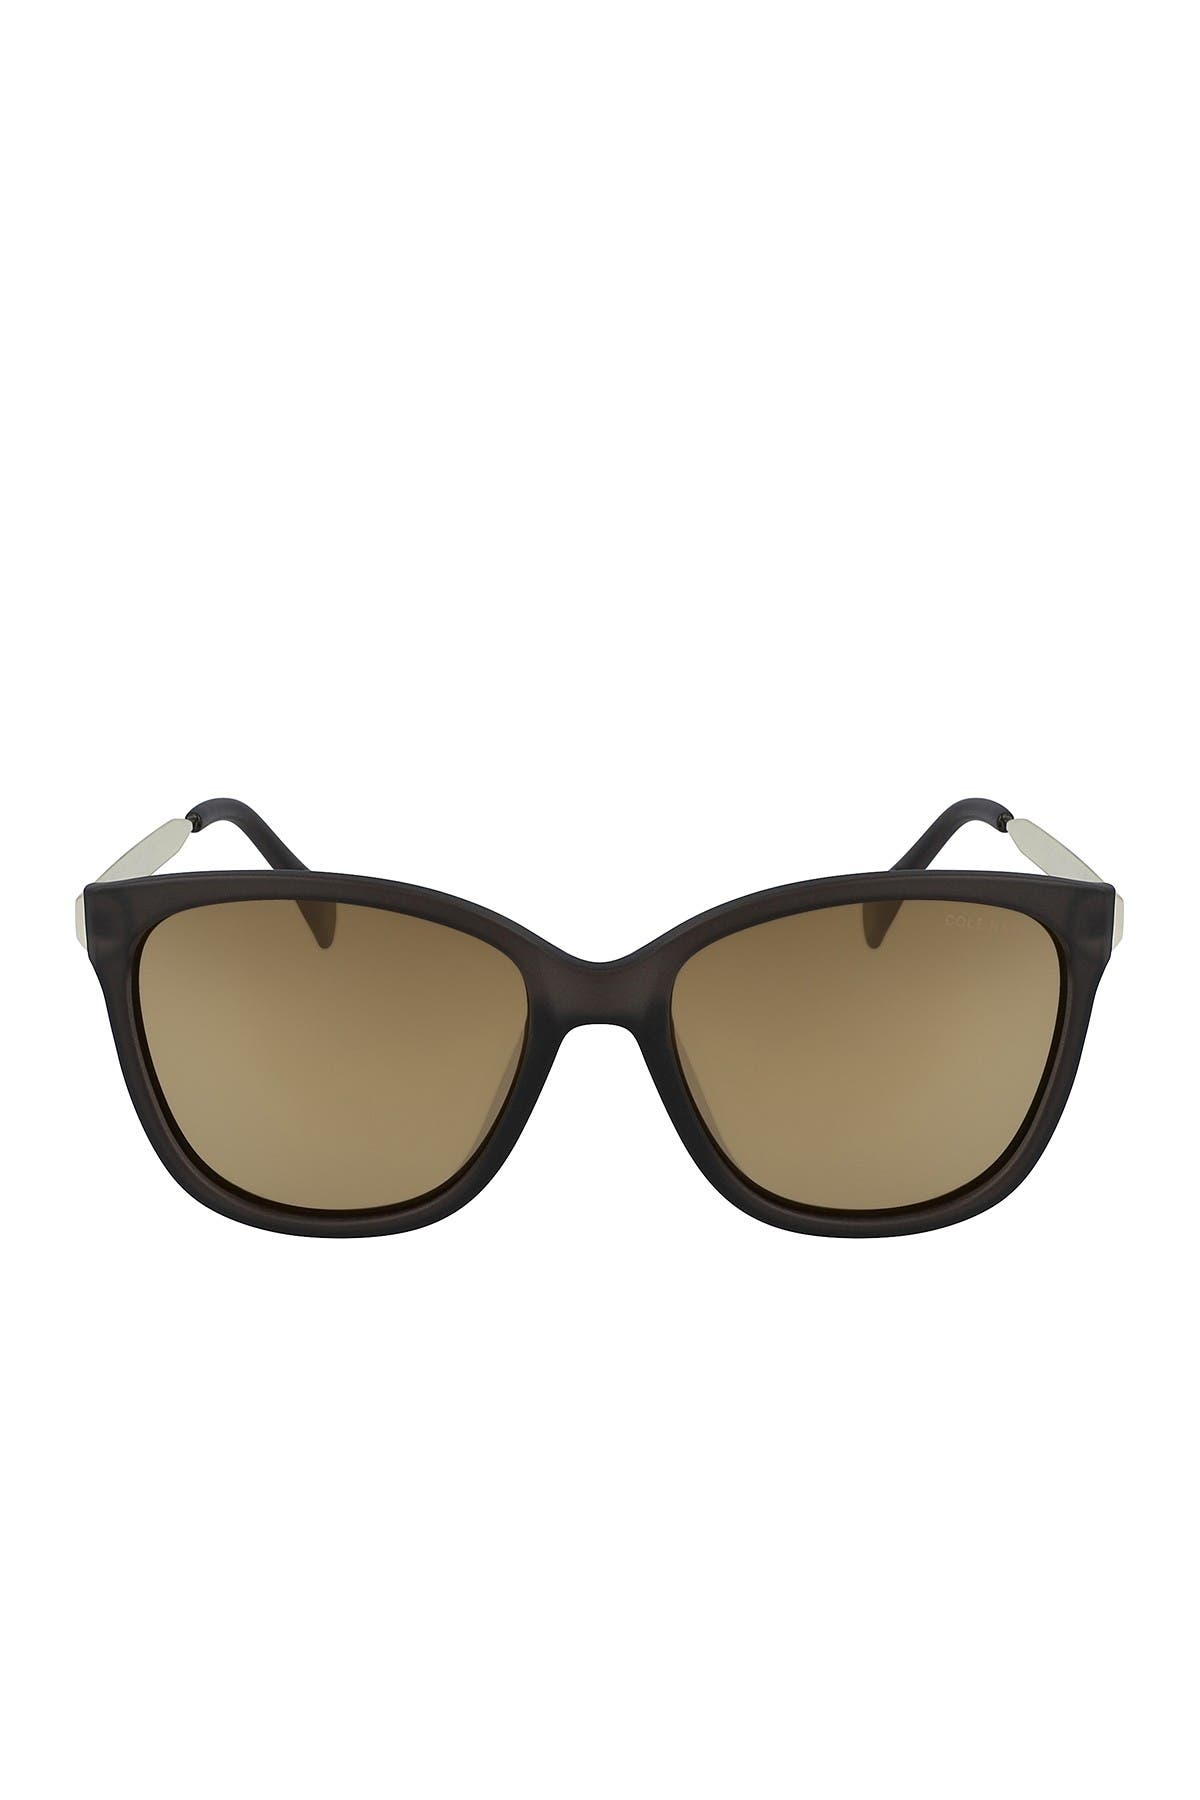 Image of Cole Haan 57mm Sleek Square Sunglasses